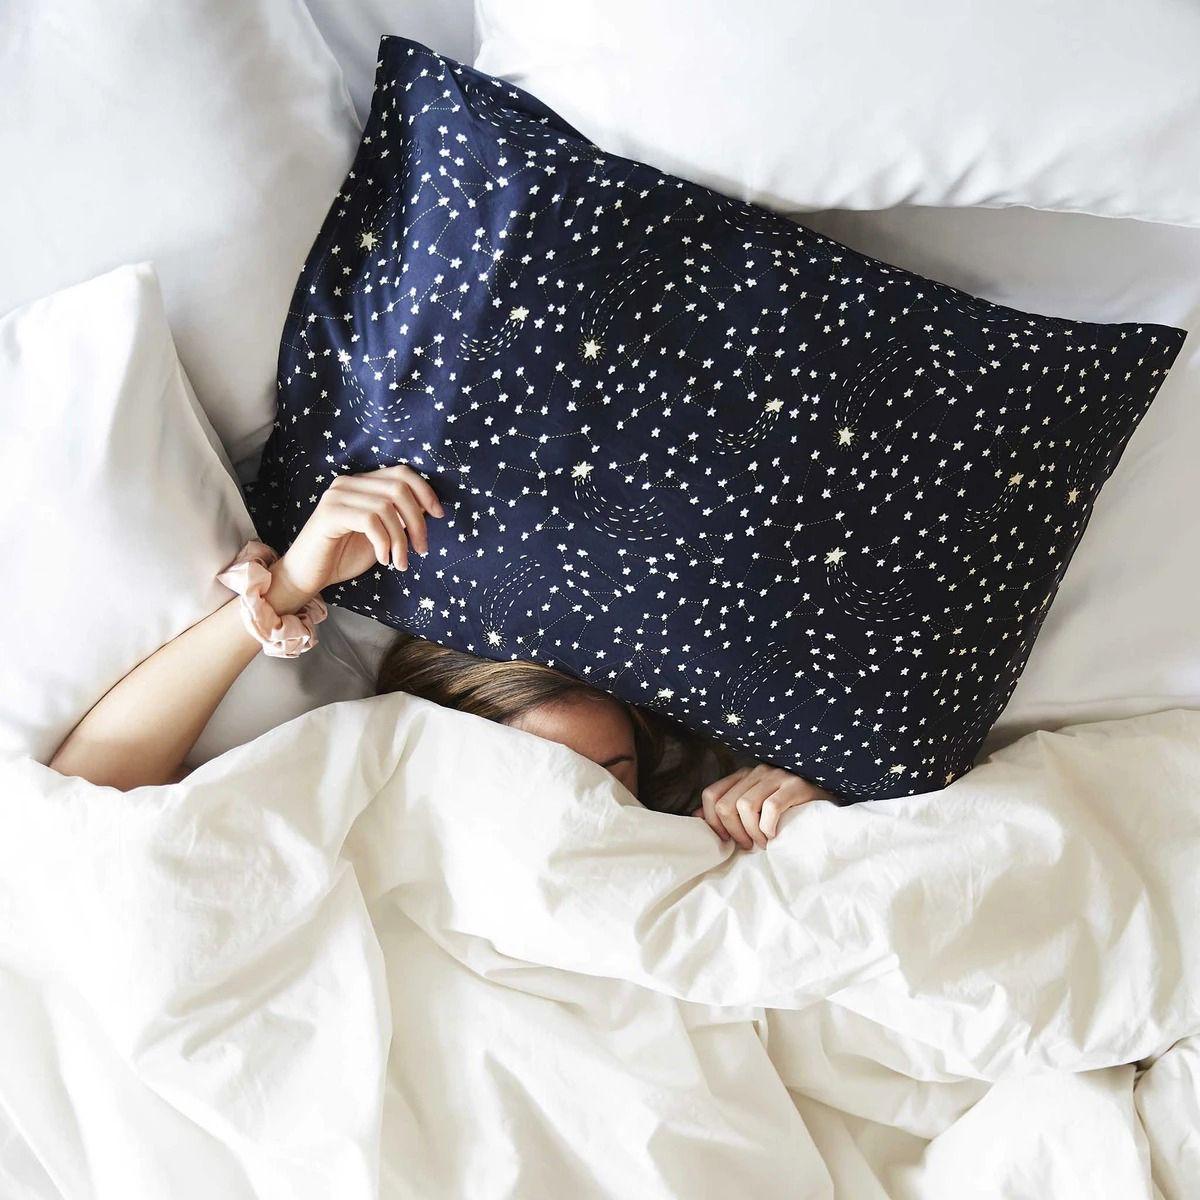 10 Best Silk Sheets For 2020 Luxurious Silk Sheet Sets,Van Gogh Study Of Bedroom In Arles